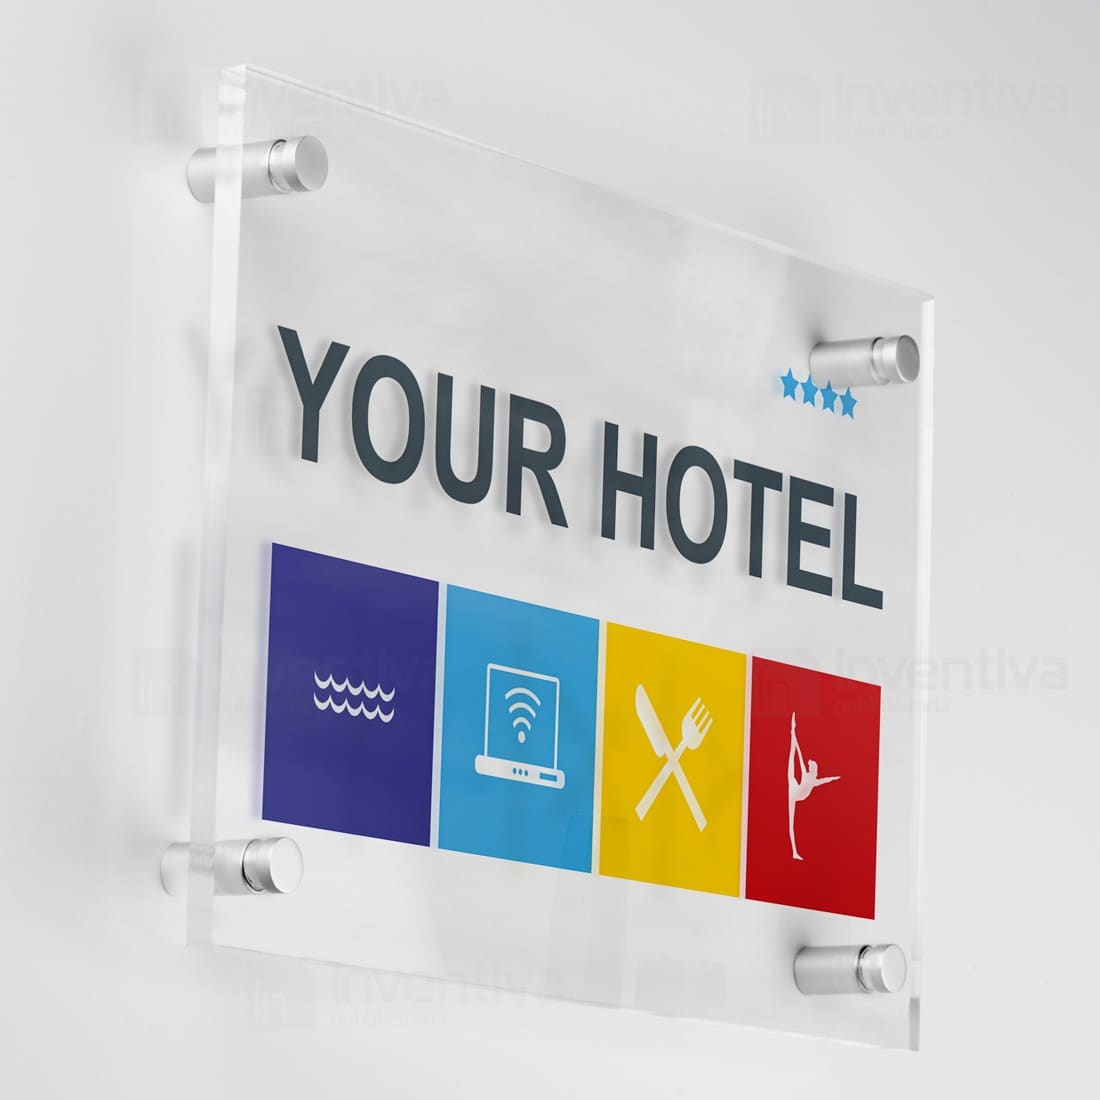 Targhe orizzontale spigoli retti targhe in plexiglass - Targhe porta plexiglass ...